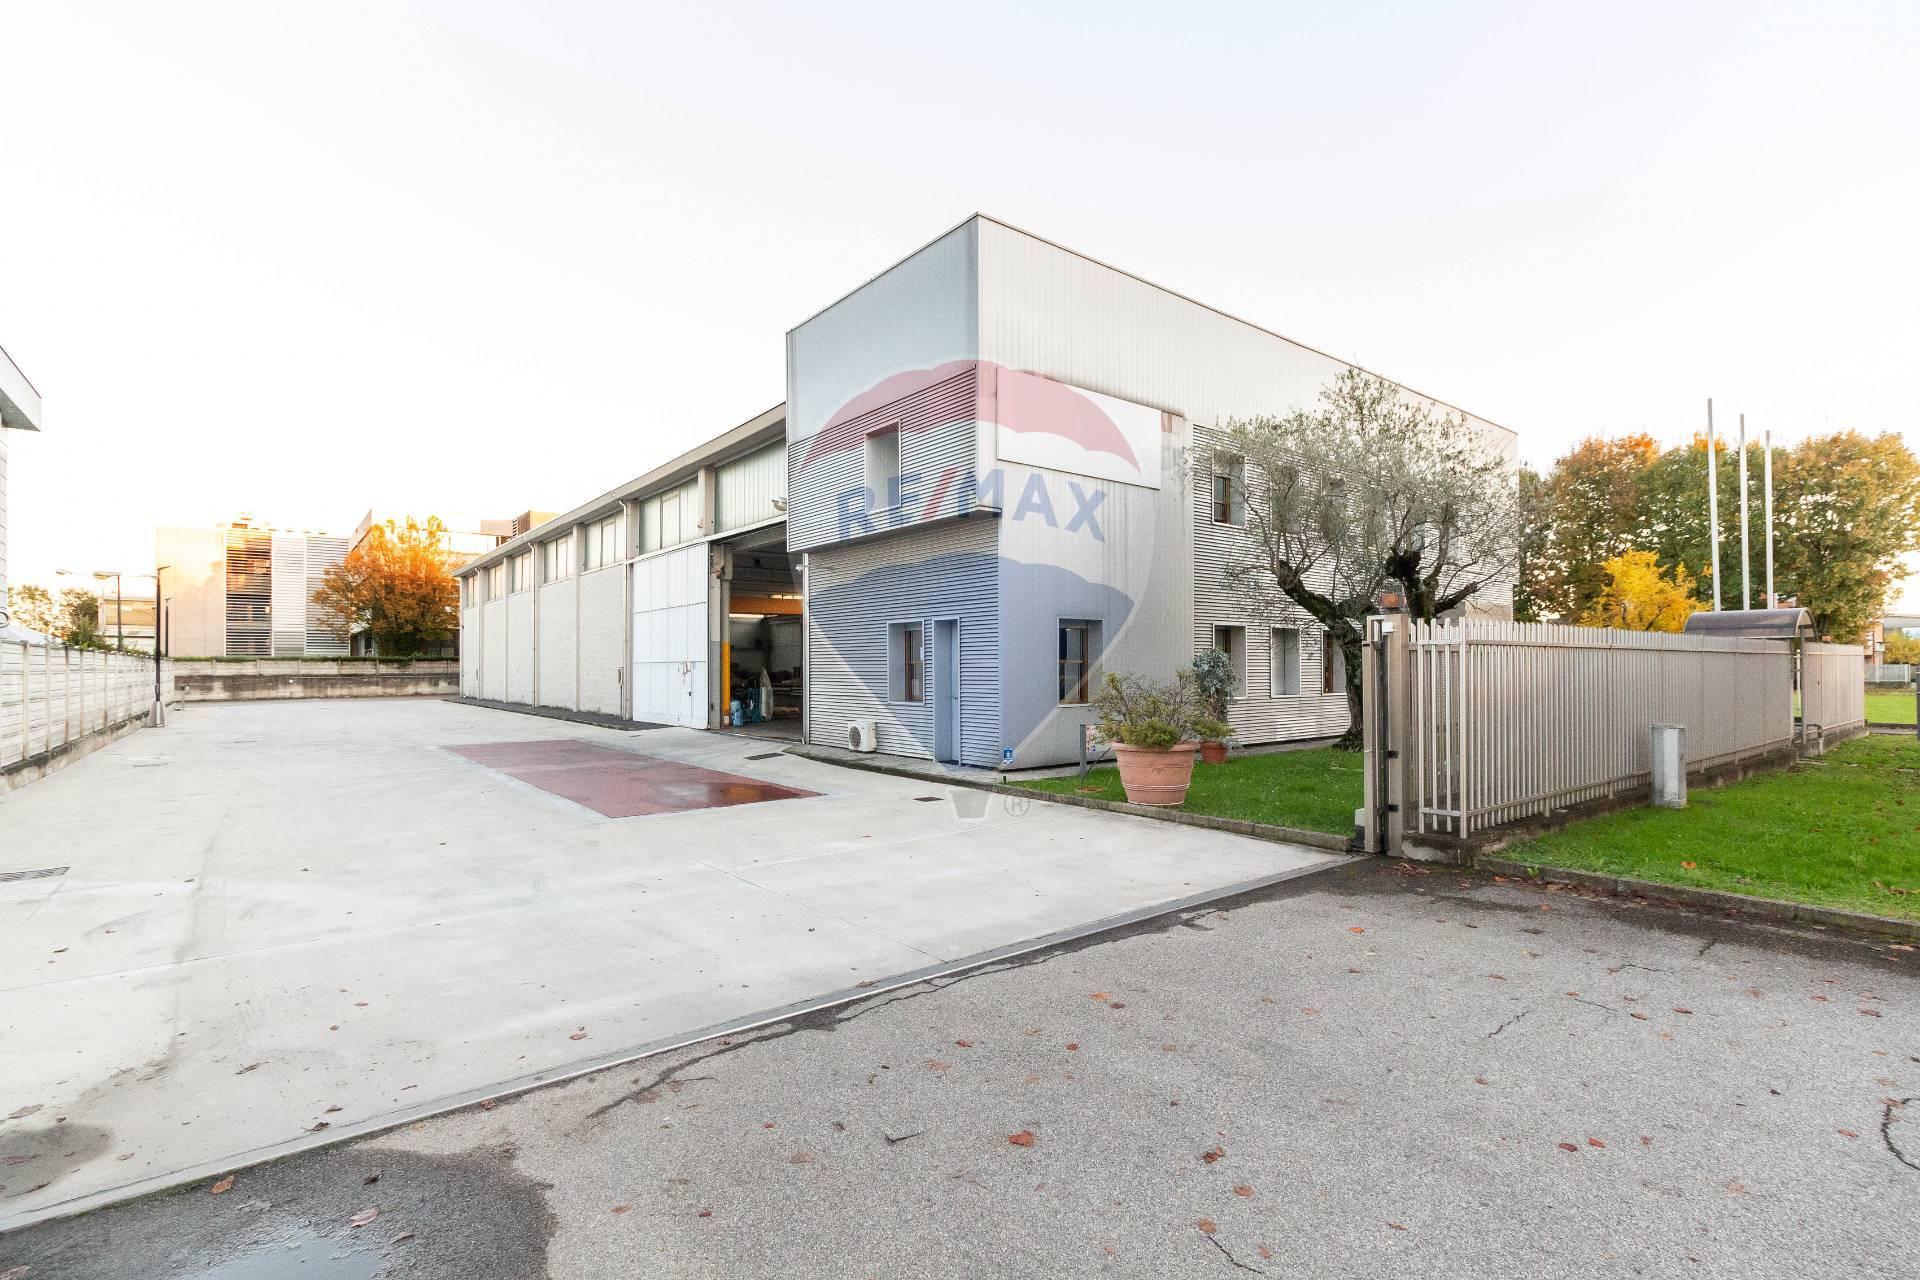 Vendita Capannone Commerciale/Industriale Cernusco sul Naviglio 246341